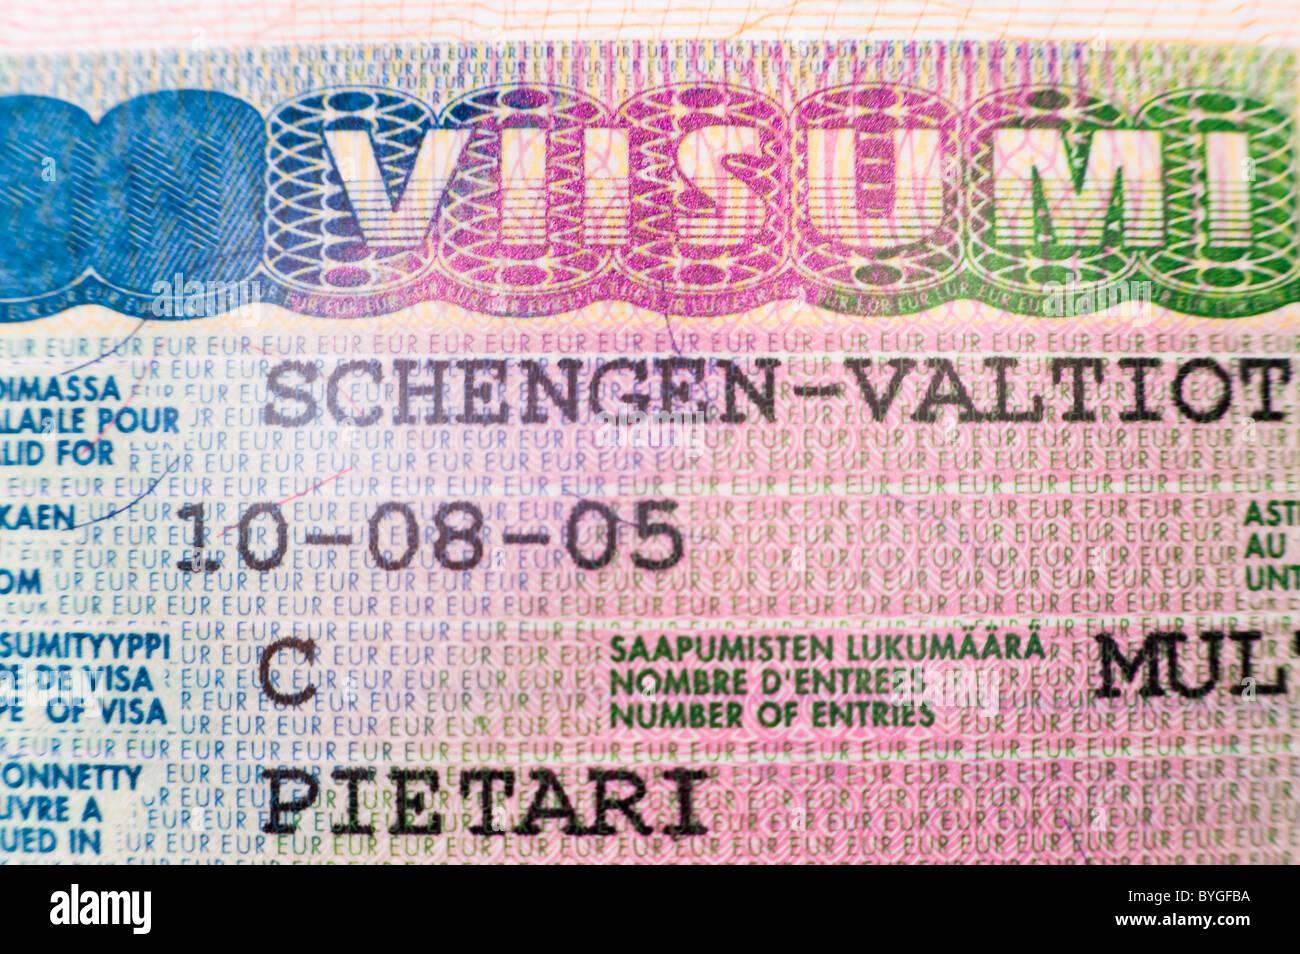 Visa Suomi